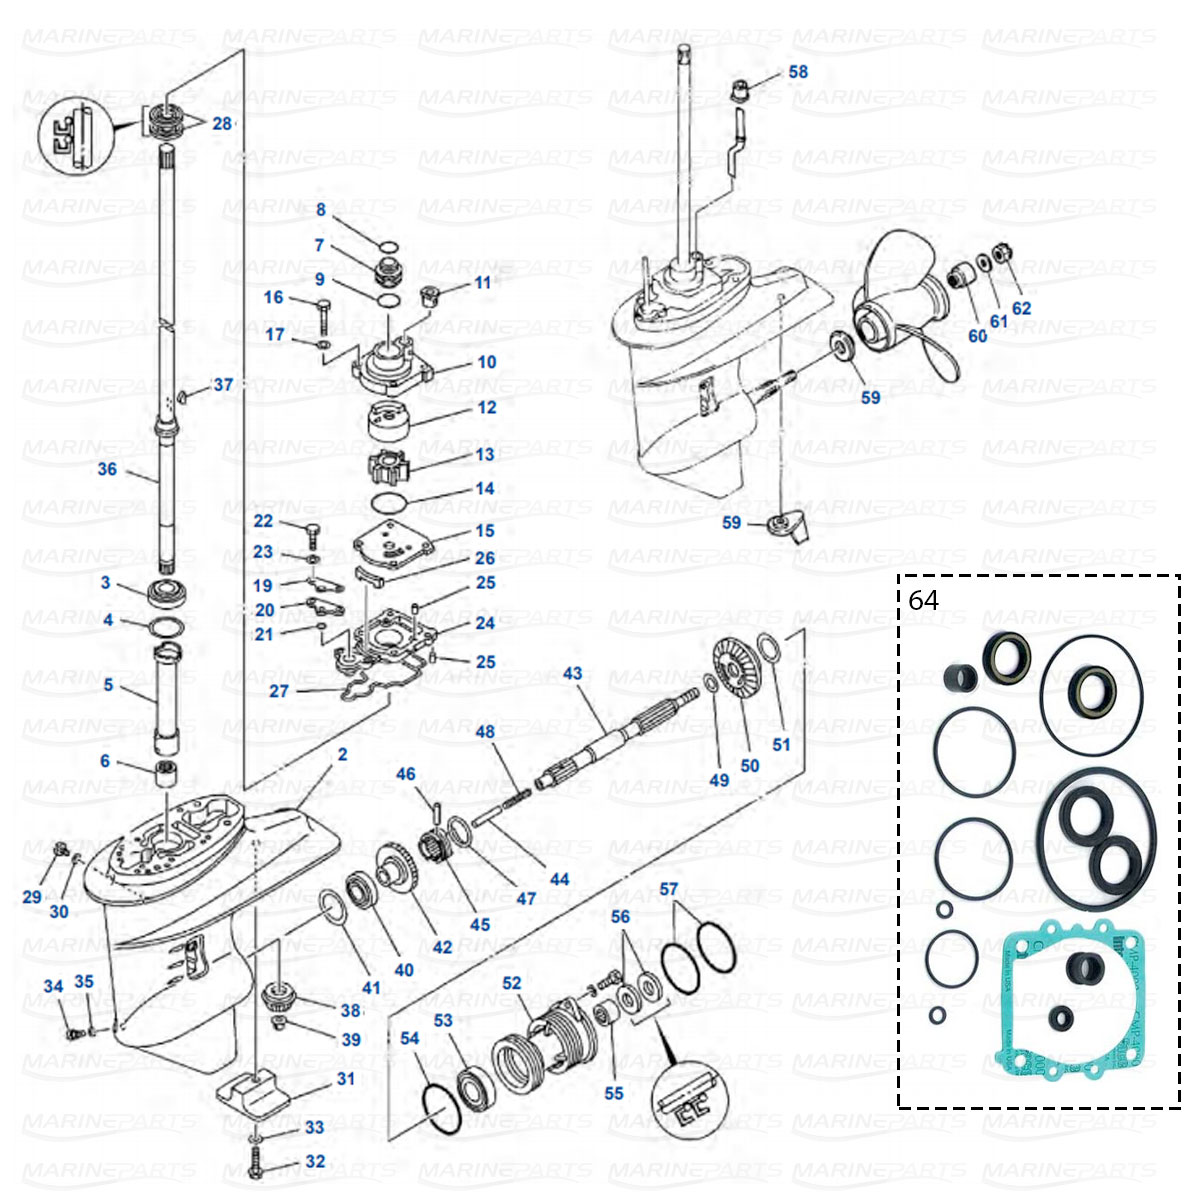 Gearcase parts Yamaha 25B - 30H